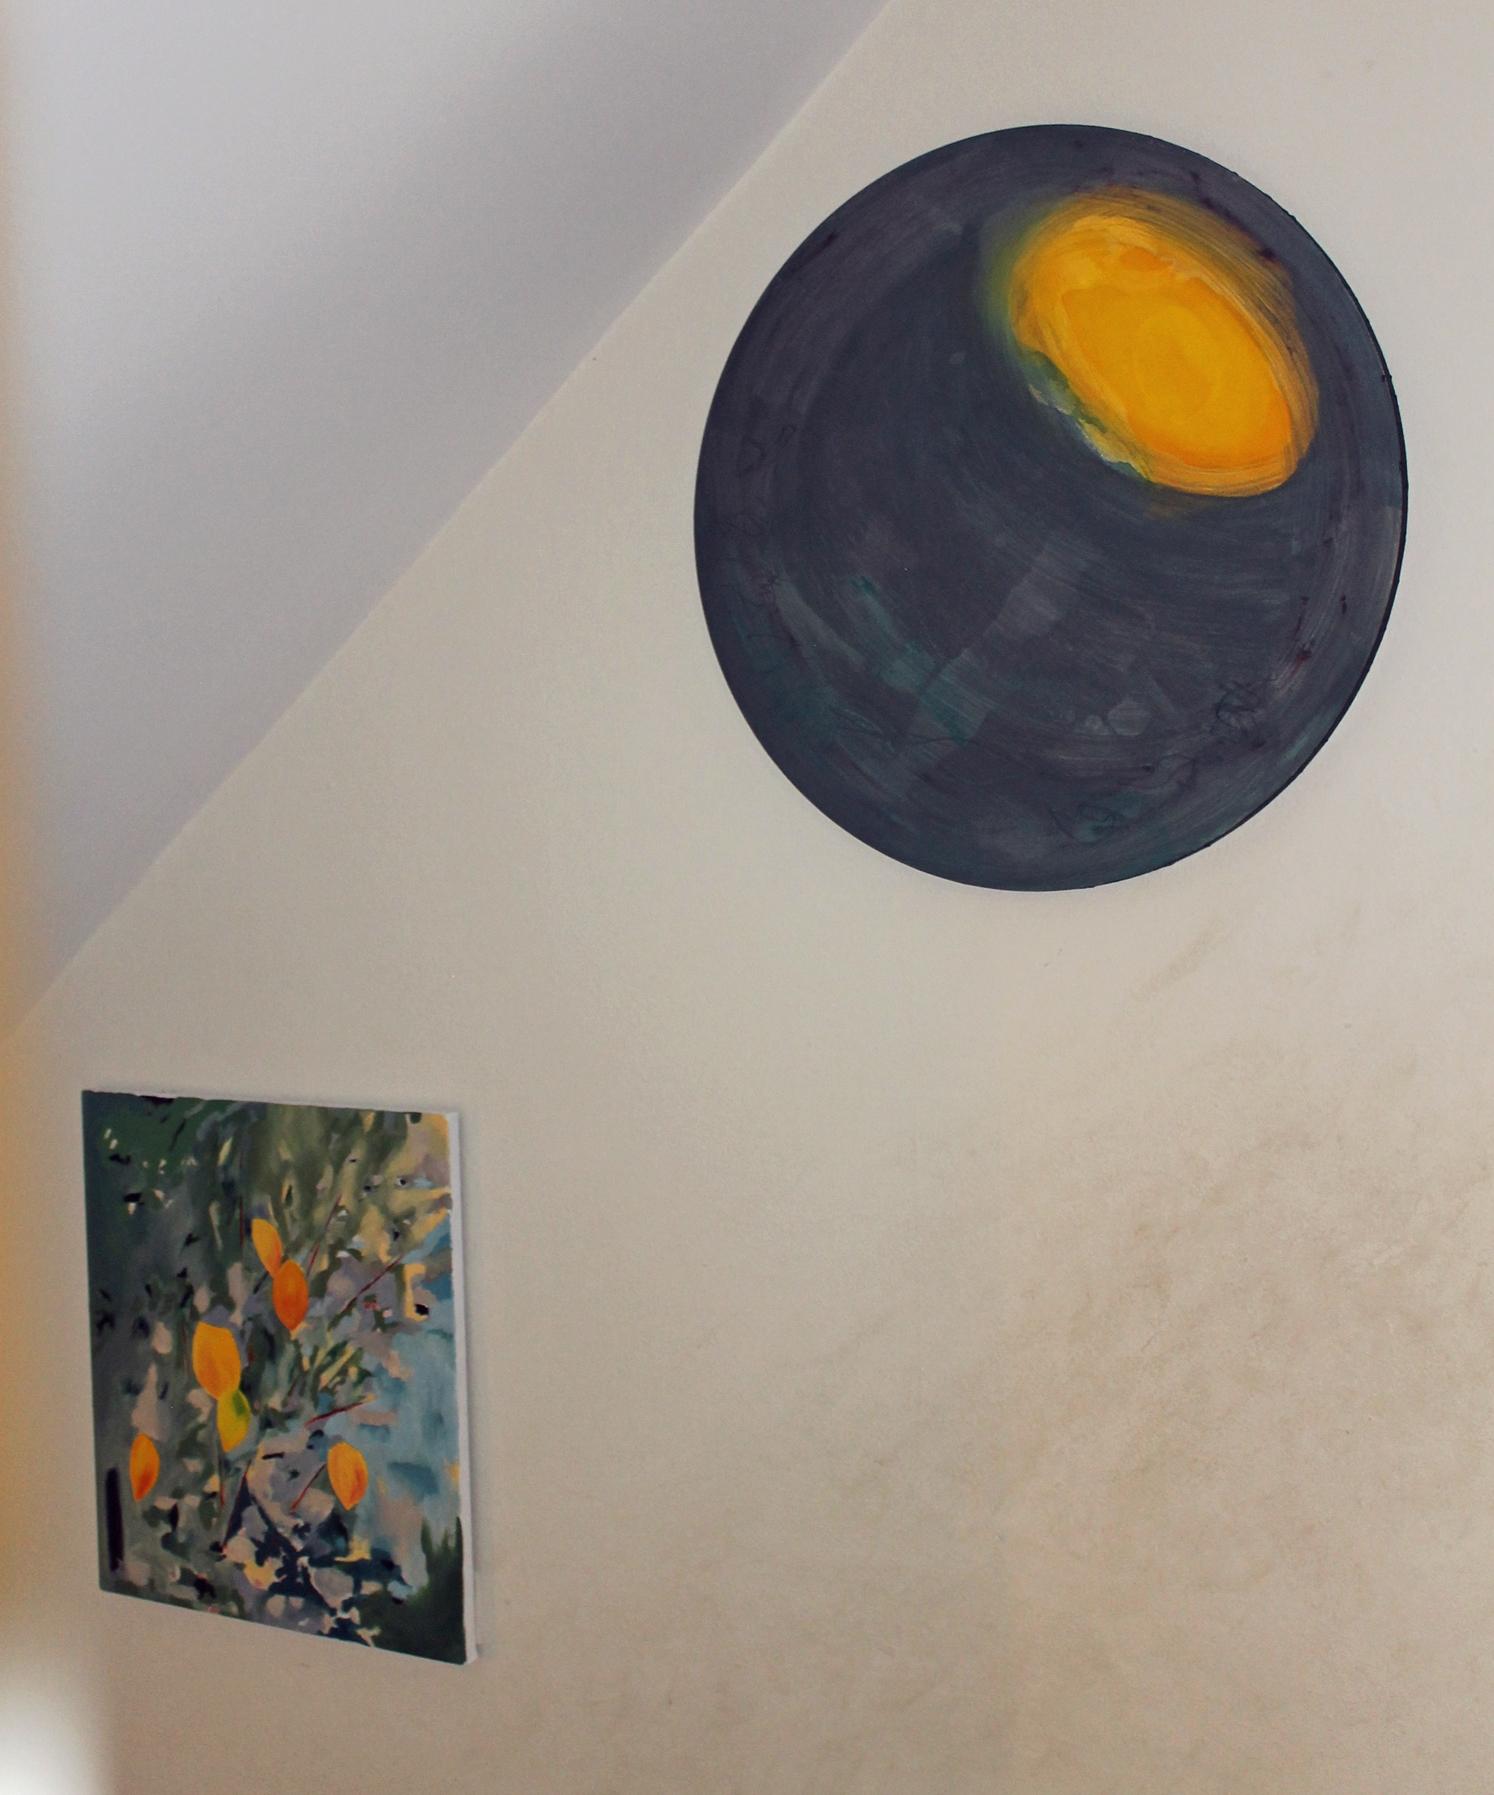 Installation view (Cornus & Lost in translation by Diana Palmer)